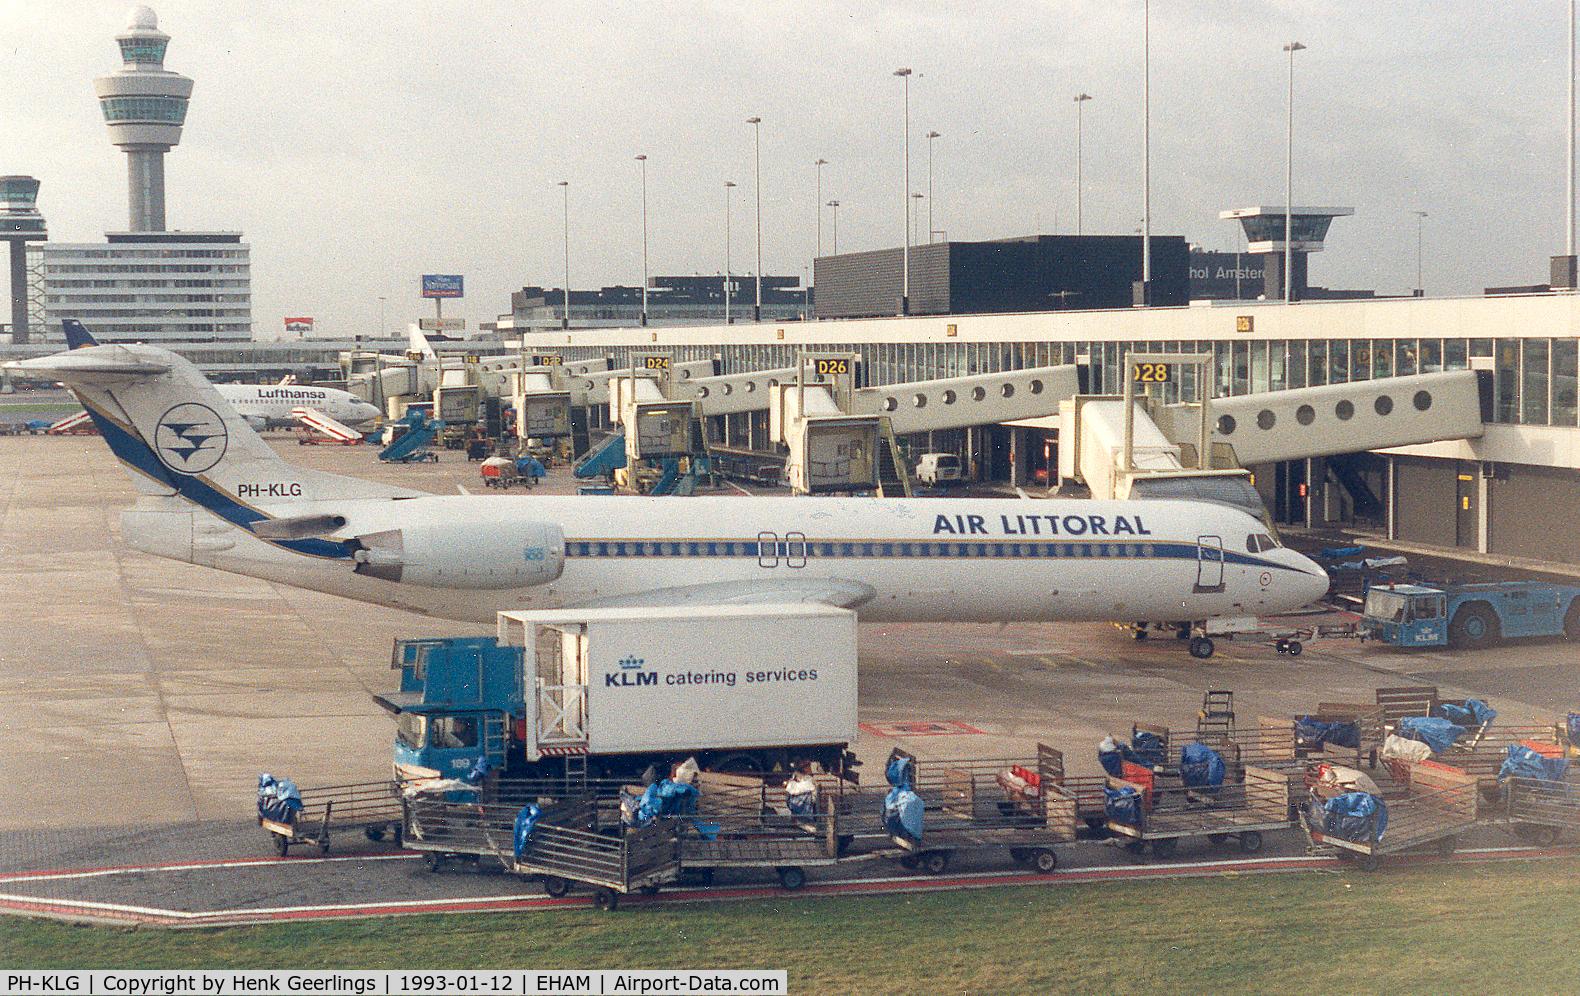 PH-KLG, 1989 Fokker 100 (F-28-0100) C/N 11271, Air Littoral